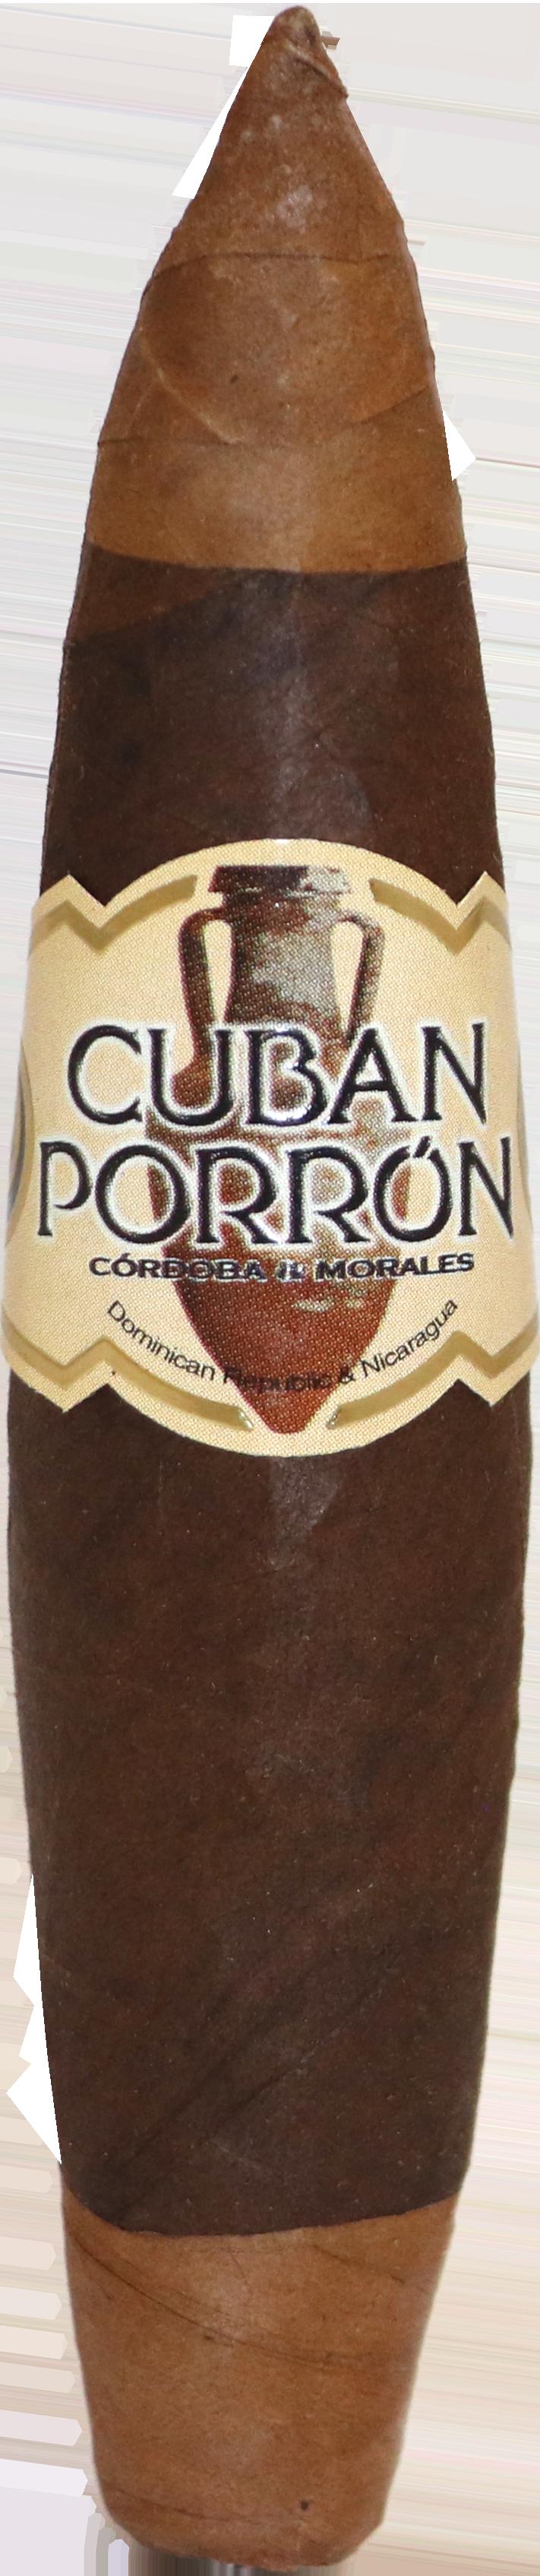 Cuban Porrón